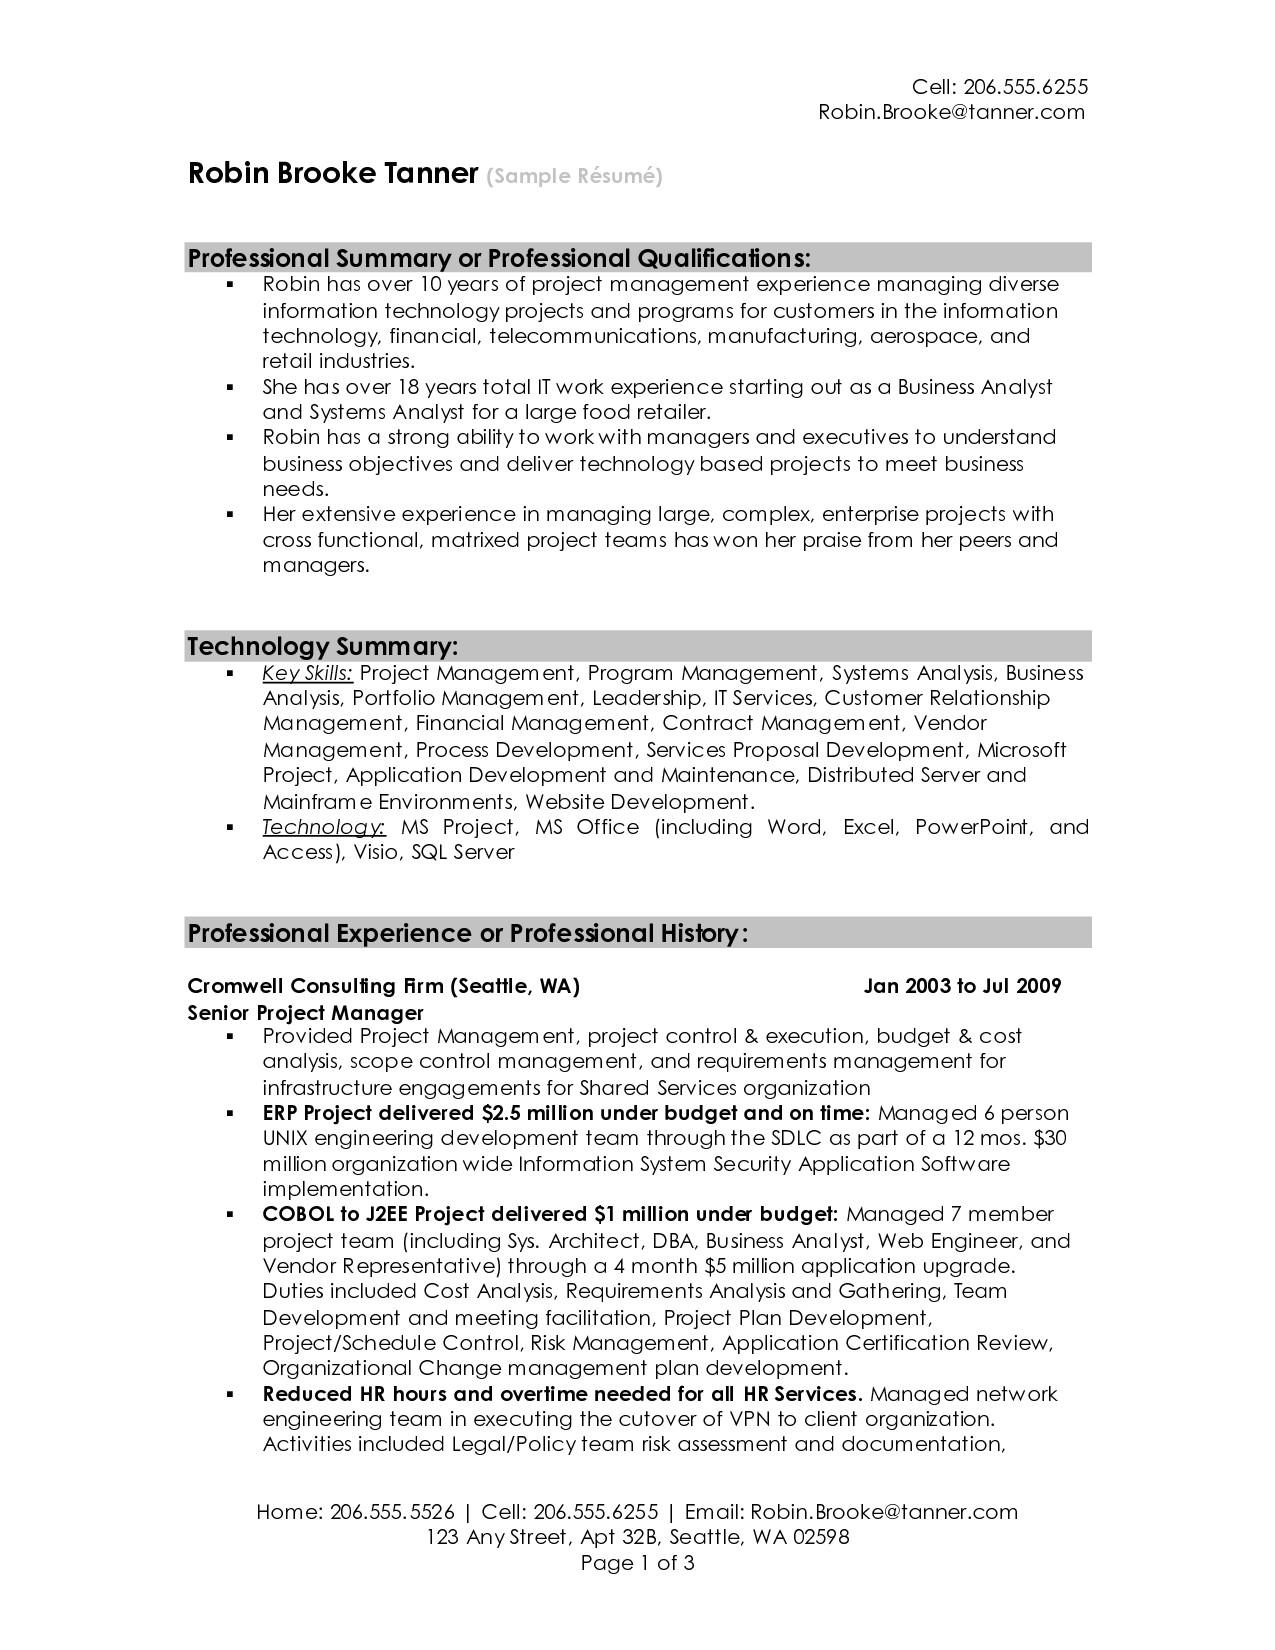 professional resume summary 2016